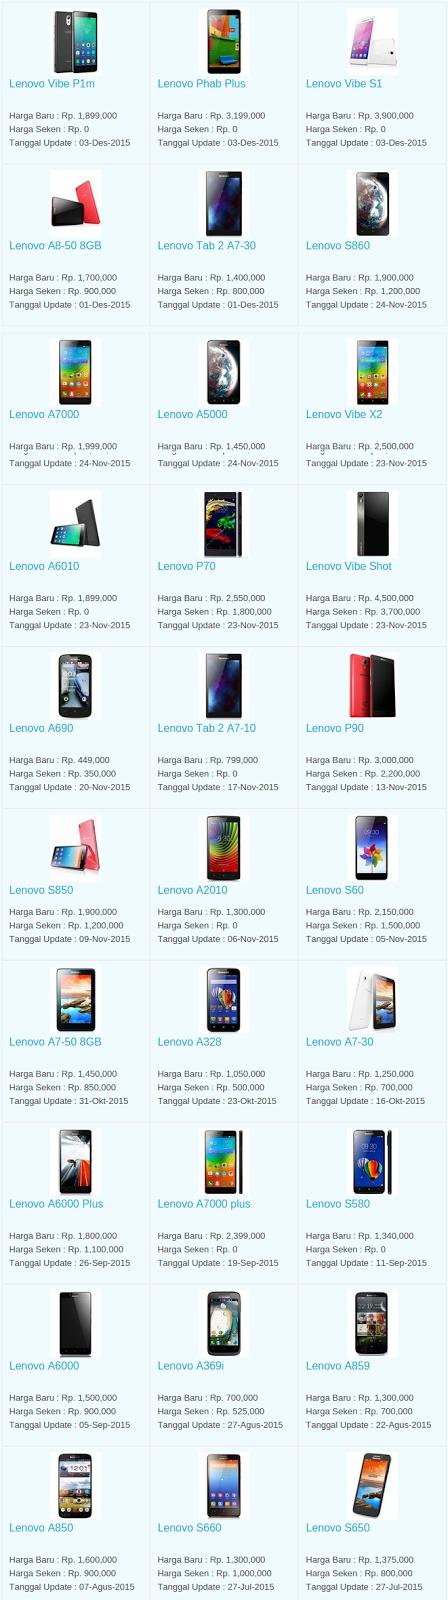 Daftar Harga Hp Lenovo Desember 2015